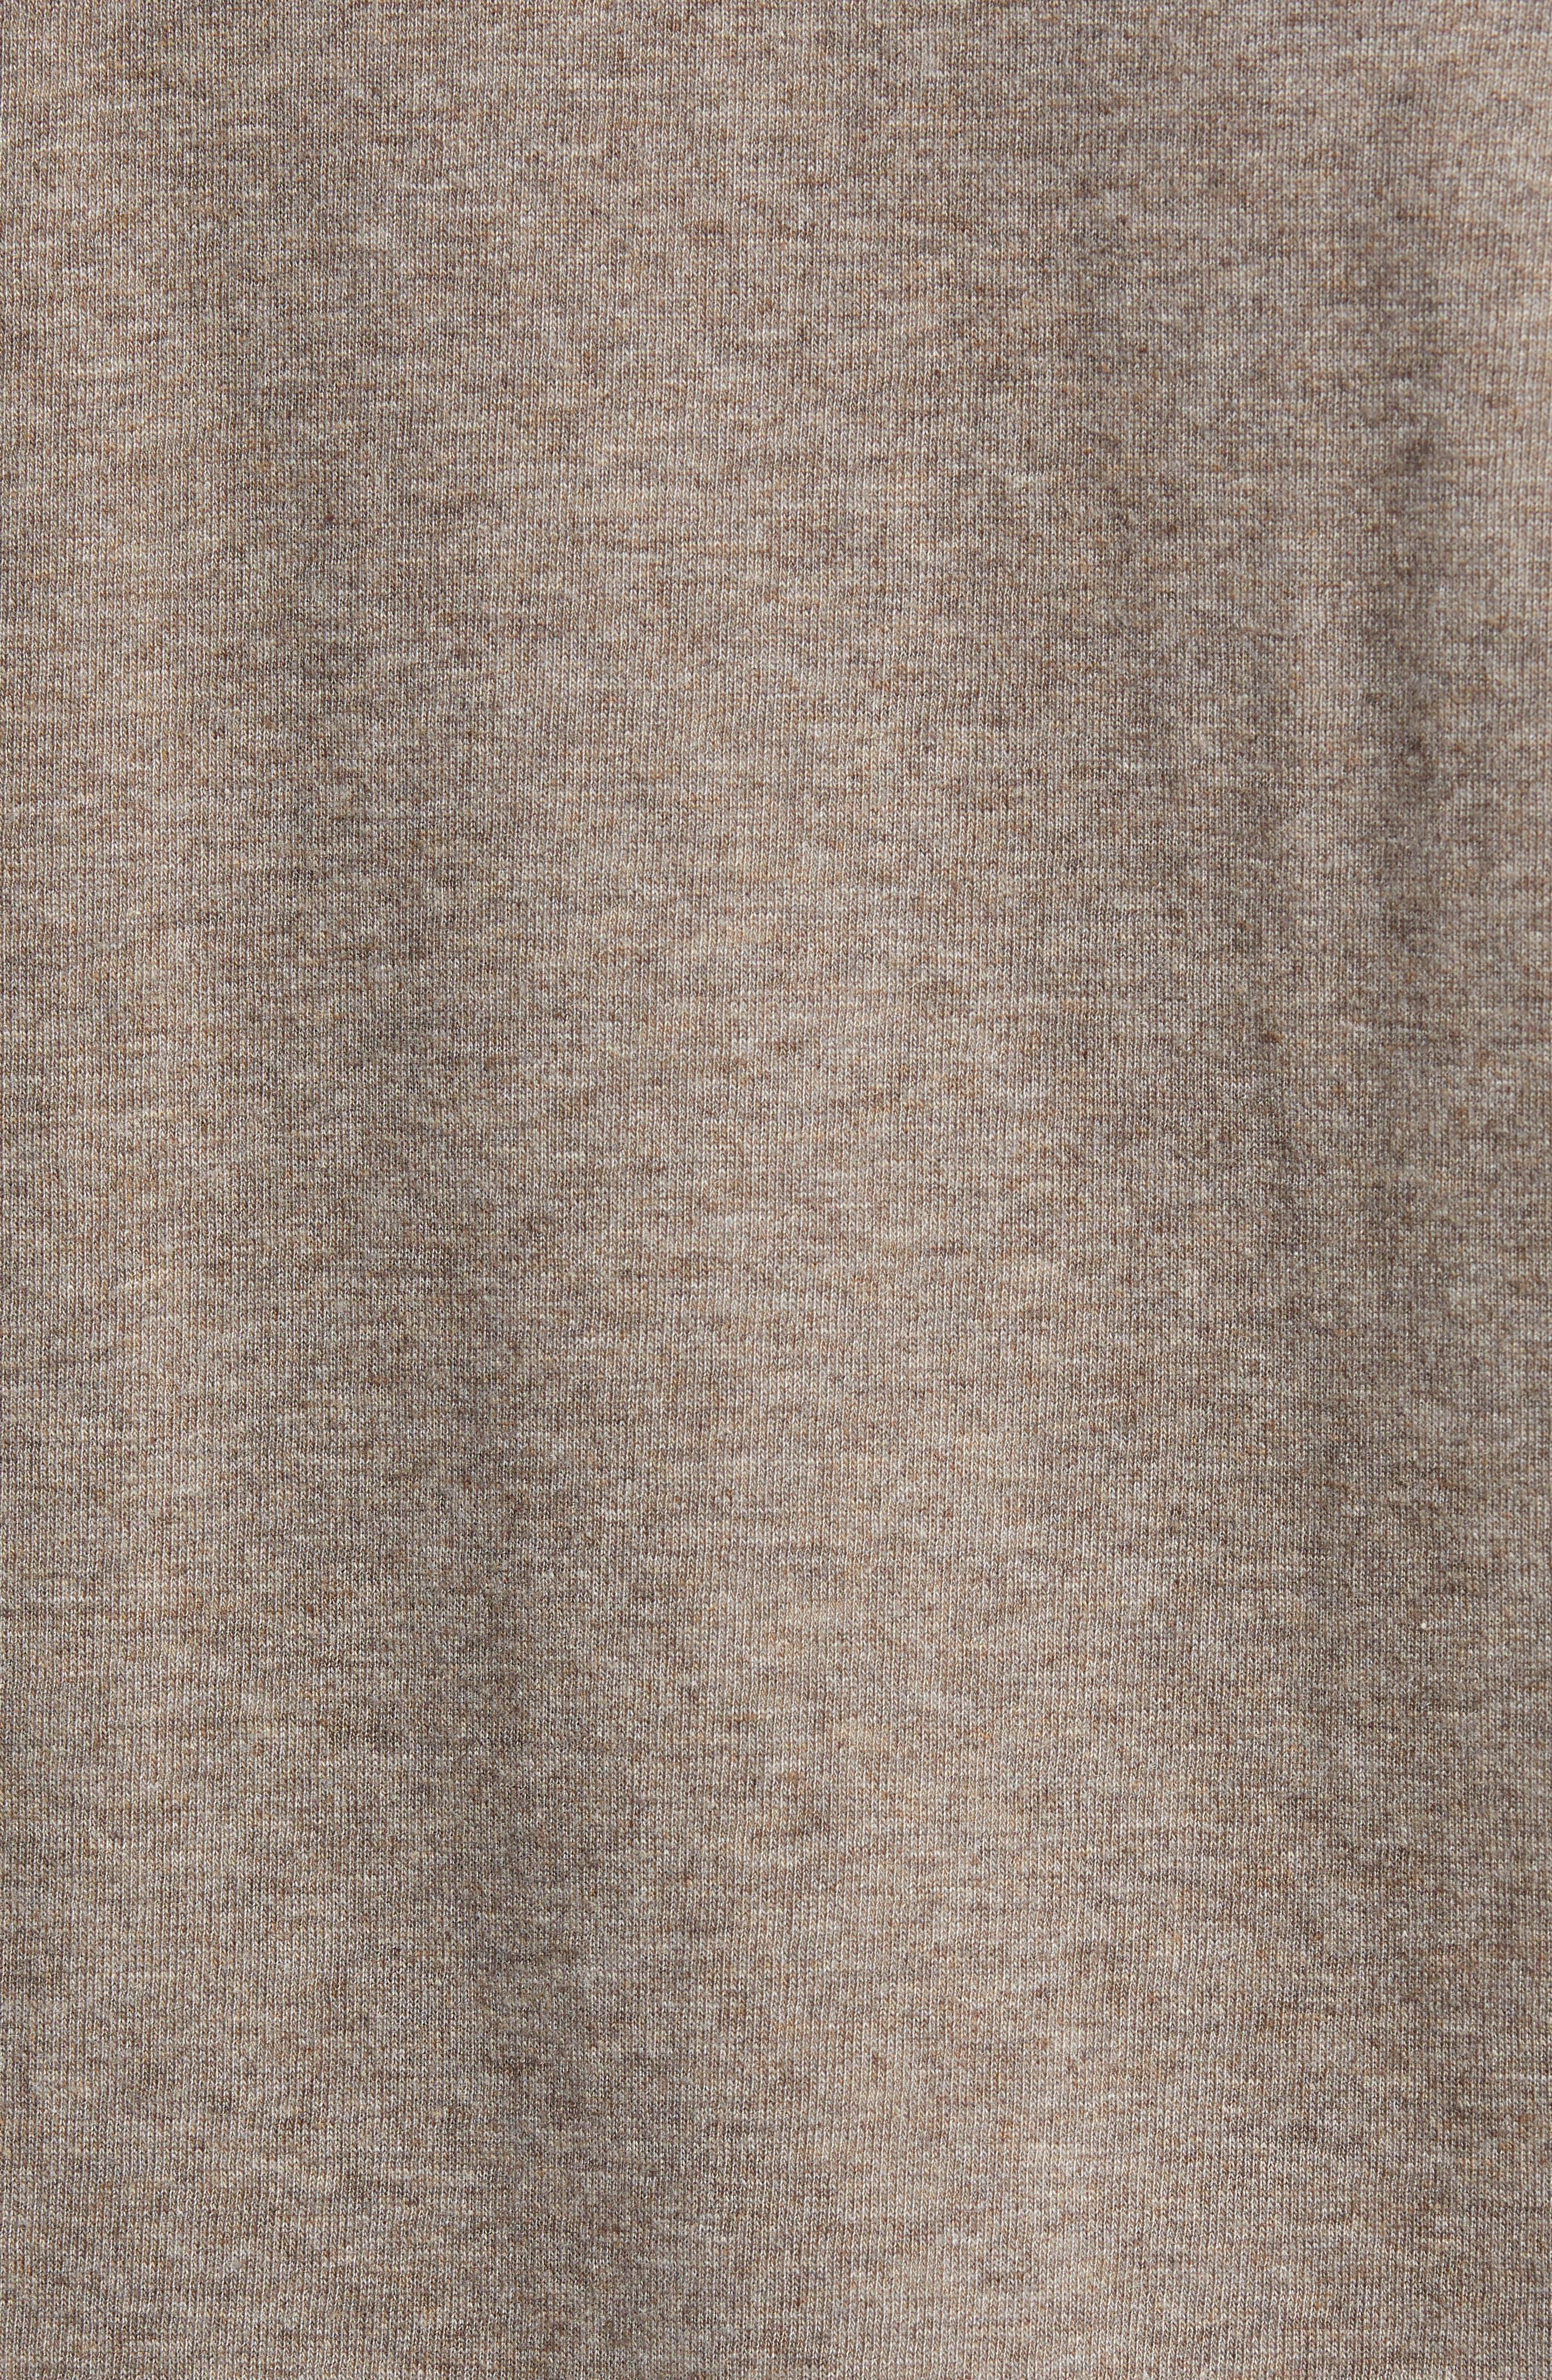 Dual Knit Regular Fit Quarter Zip Pullover,                             Alternate thumbnail 5, color,                             CHESTNUT